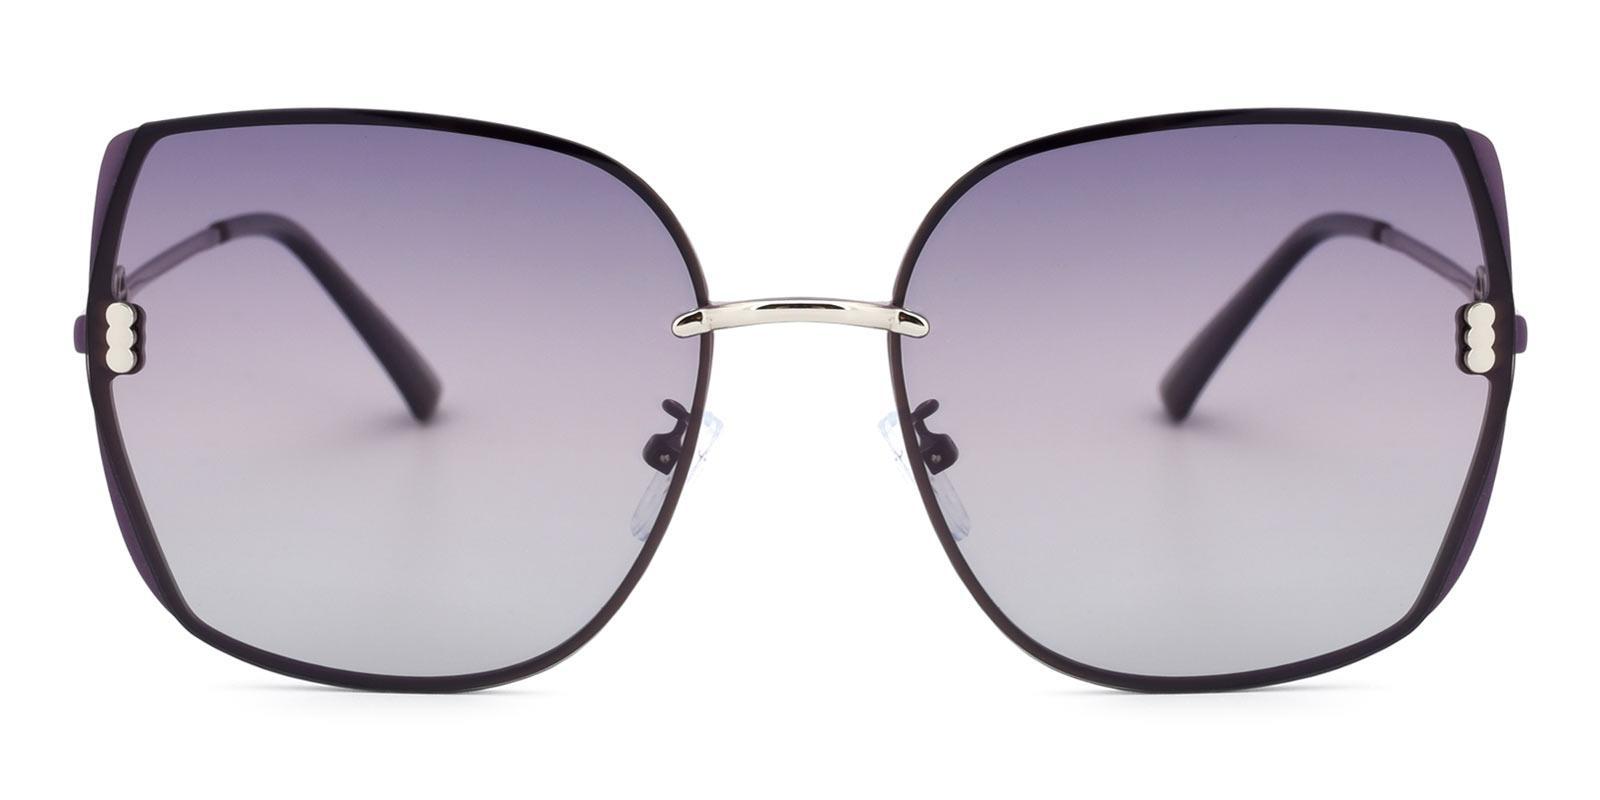 Zed-Purple-Square-Metal-Sunglasses-detail